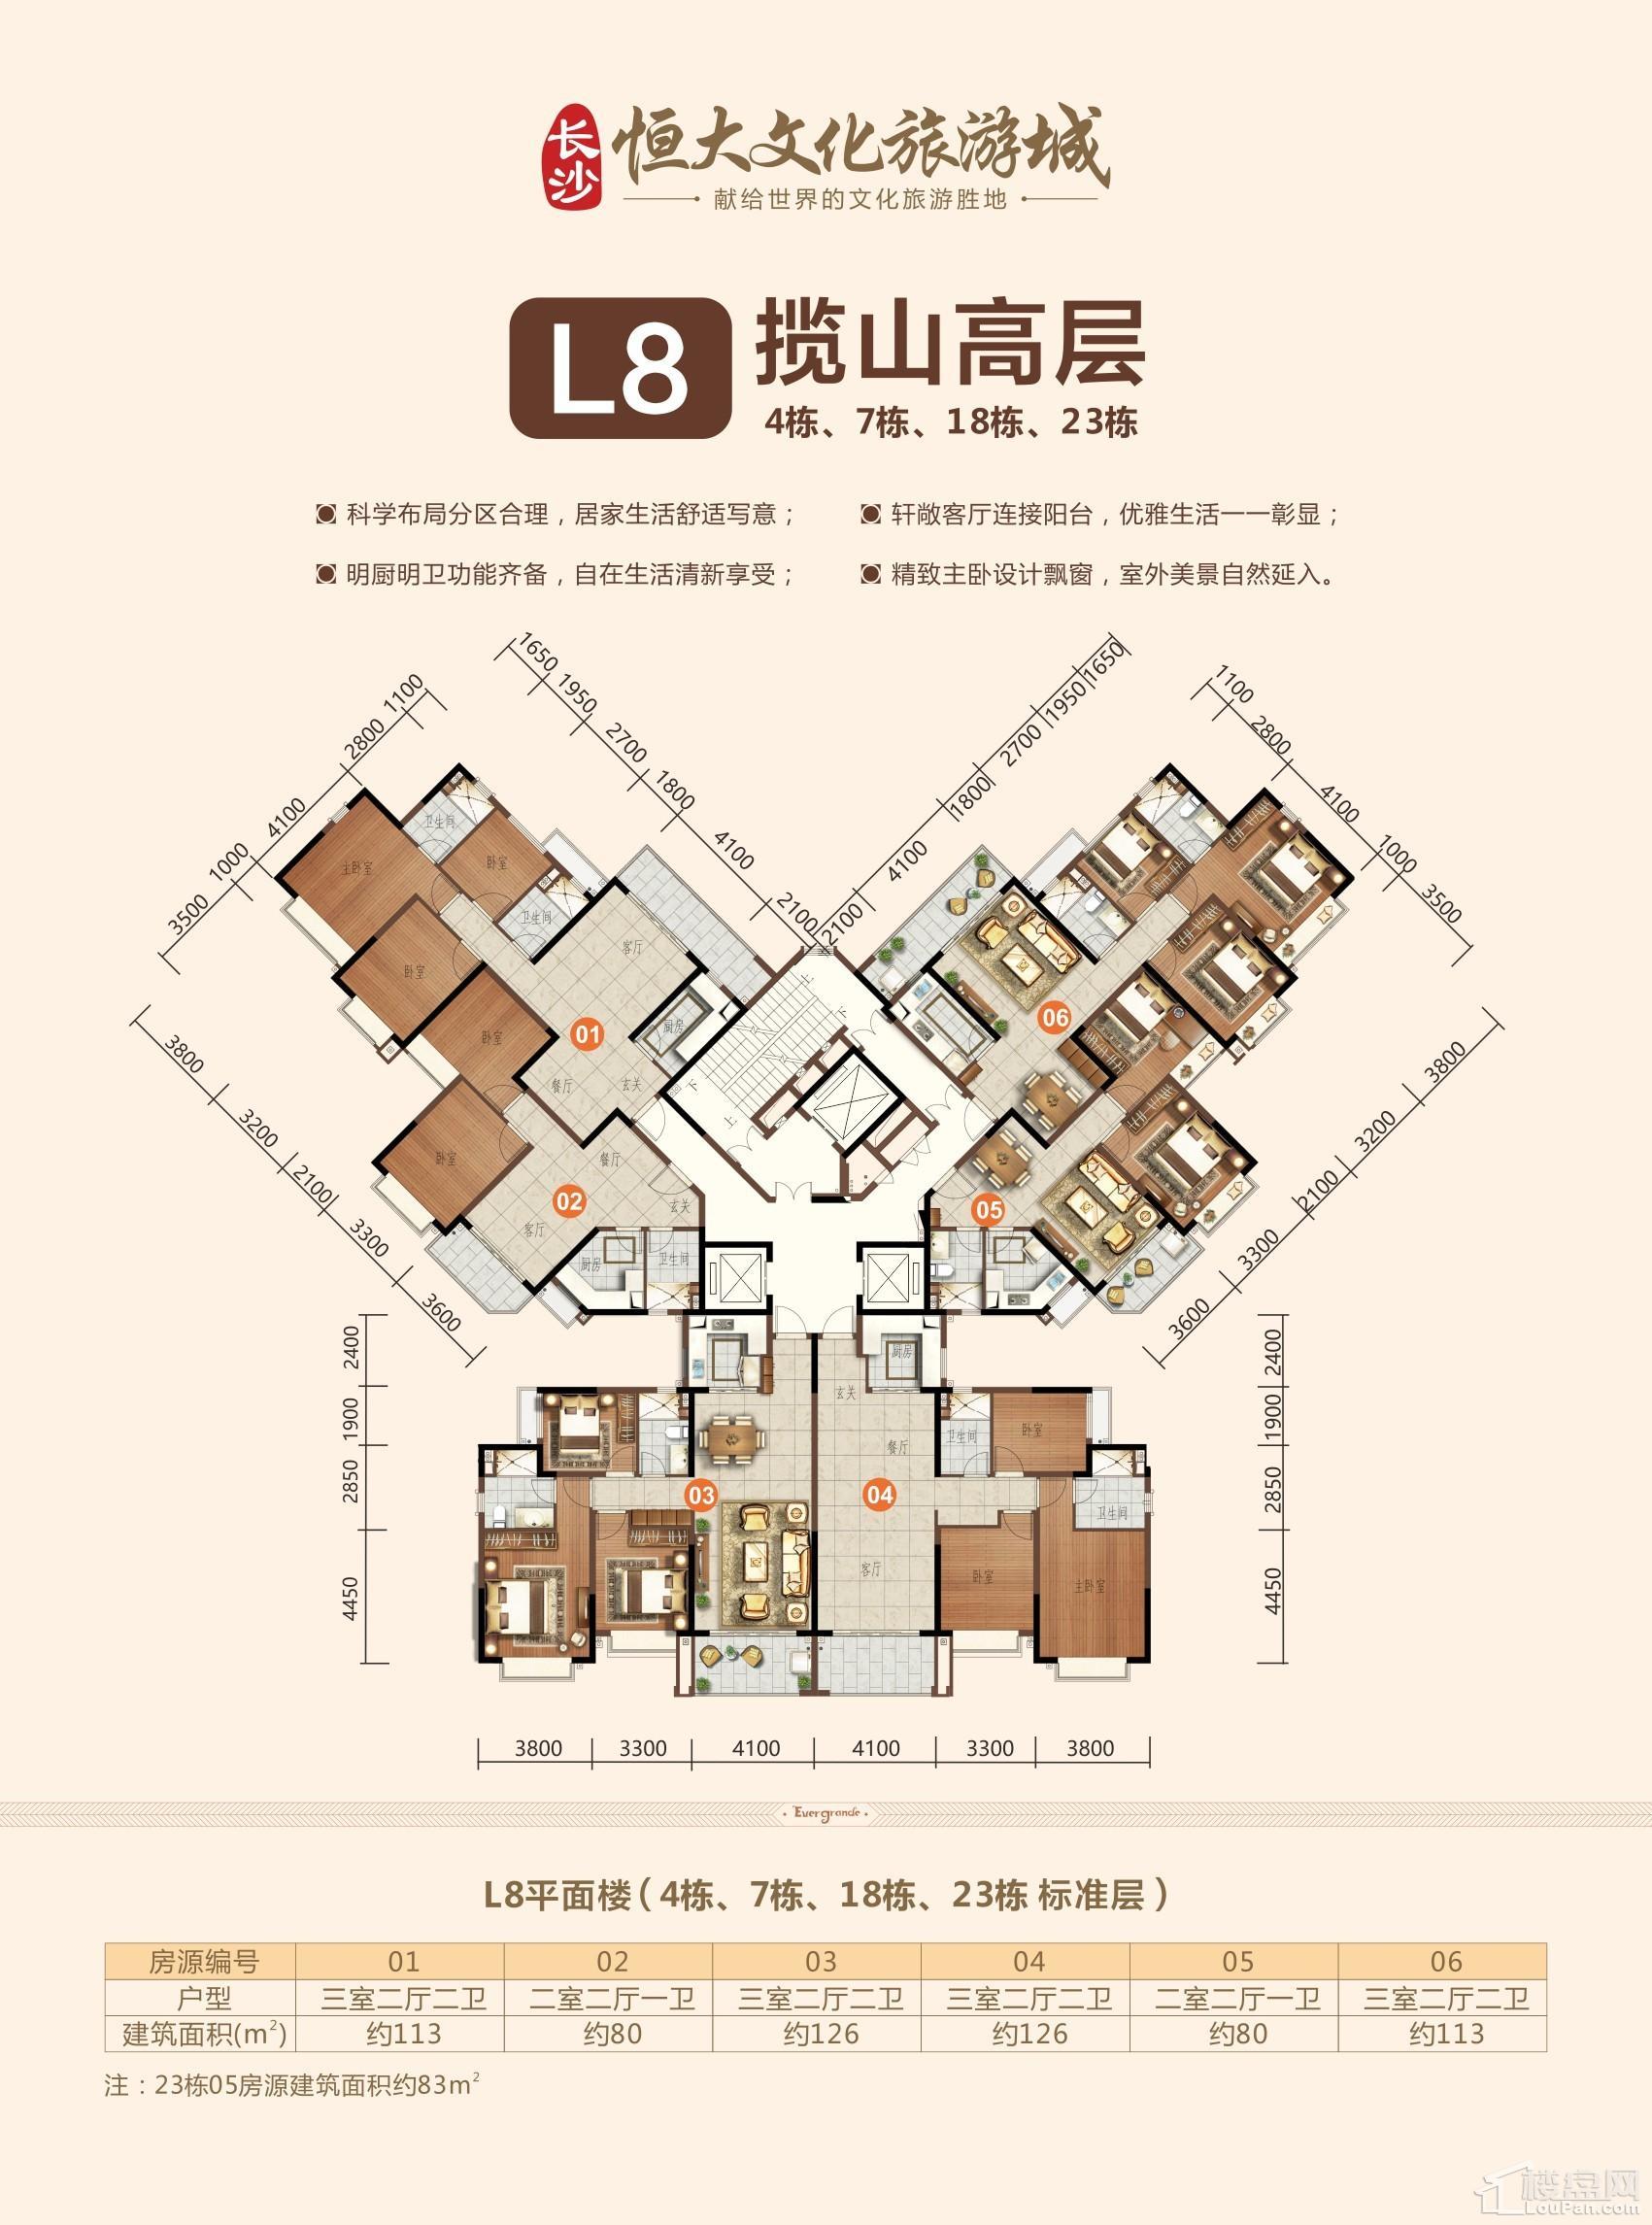 L8揽山高层